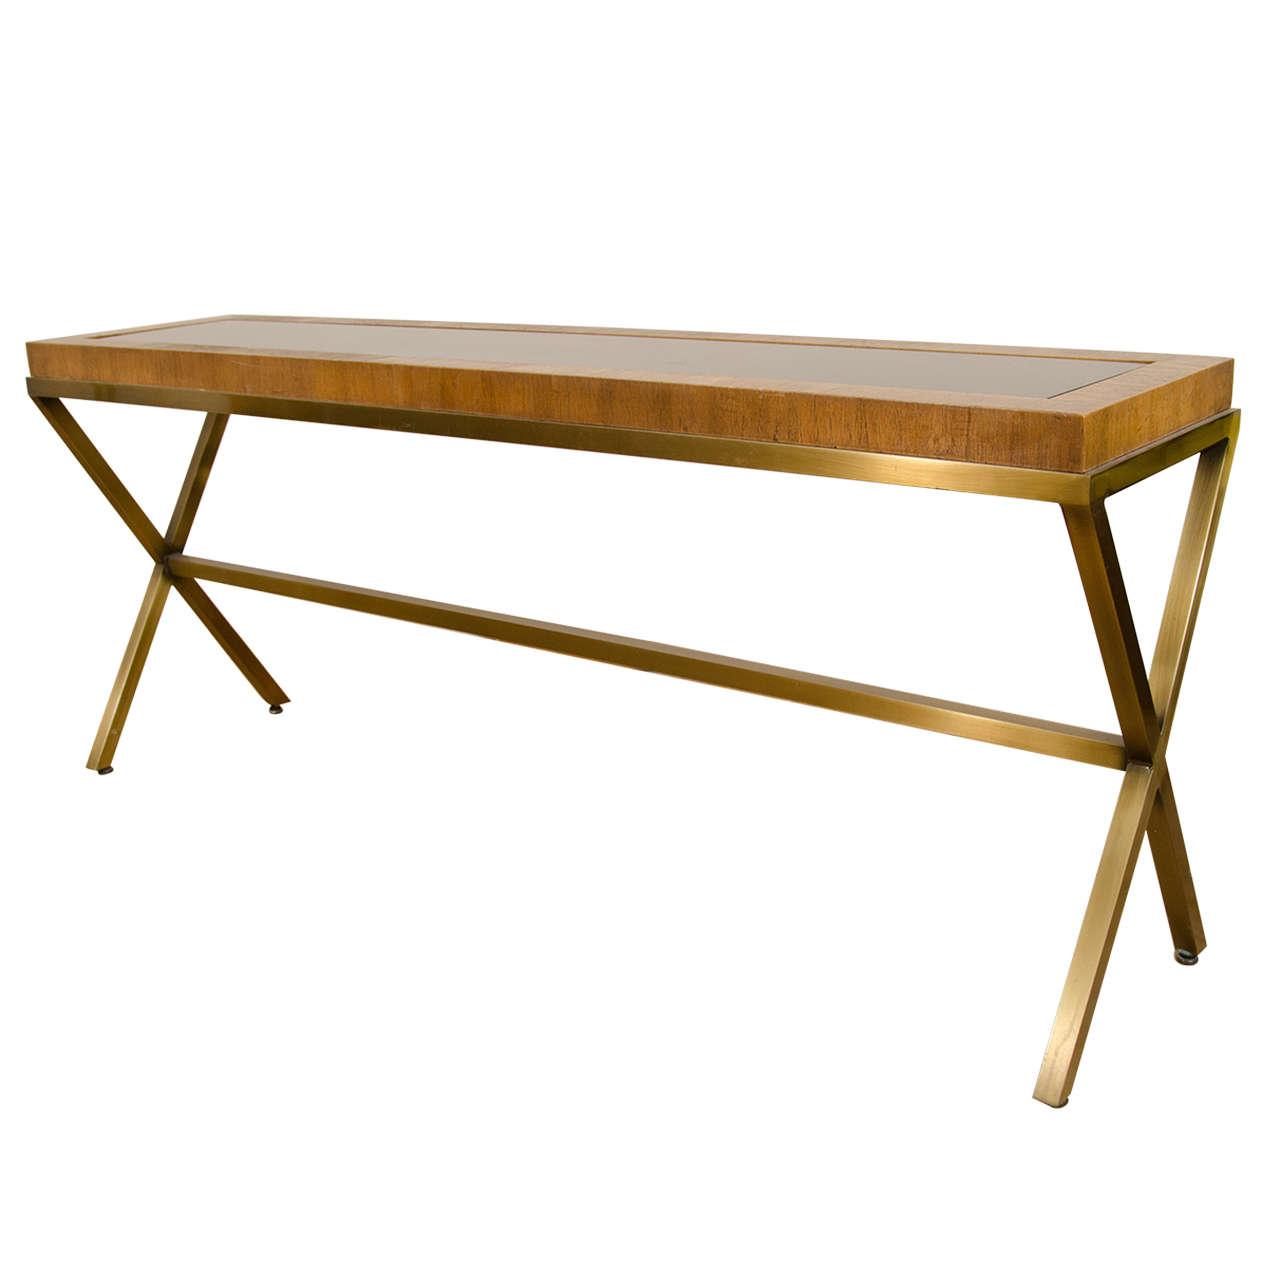 Mastercraft Furniture For Sale #24: Great Mastercraft X-Base Console Table